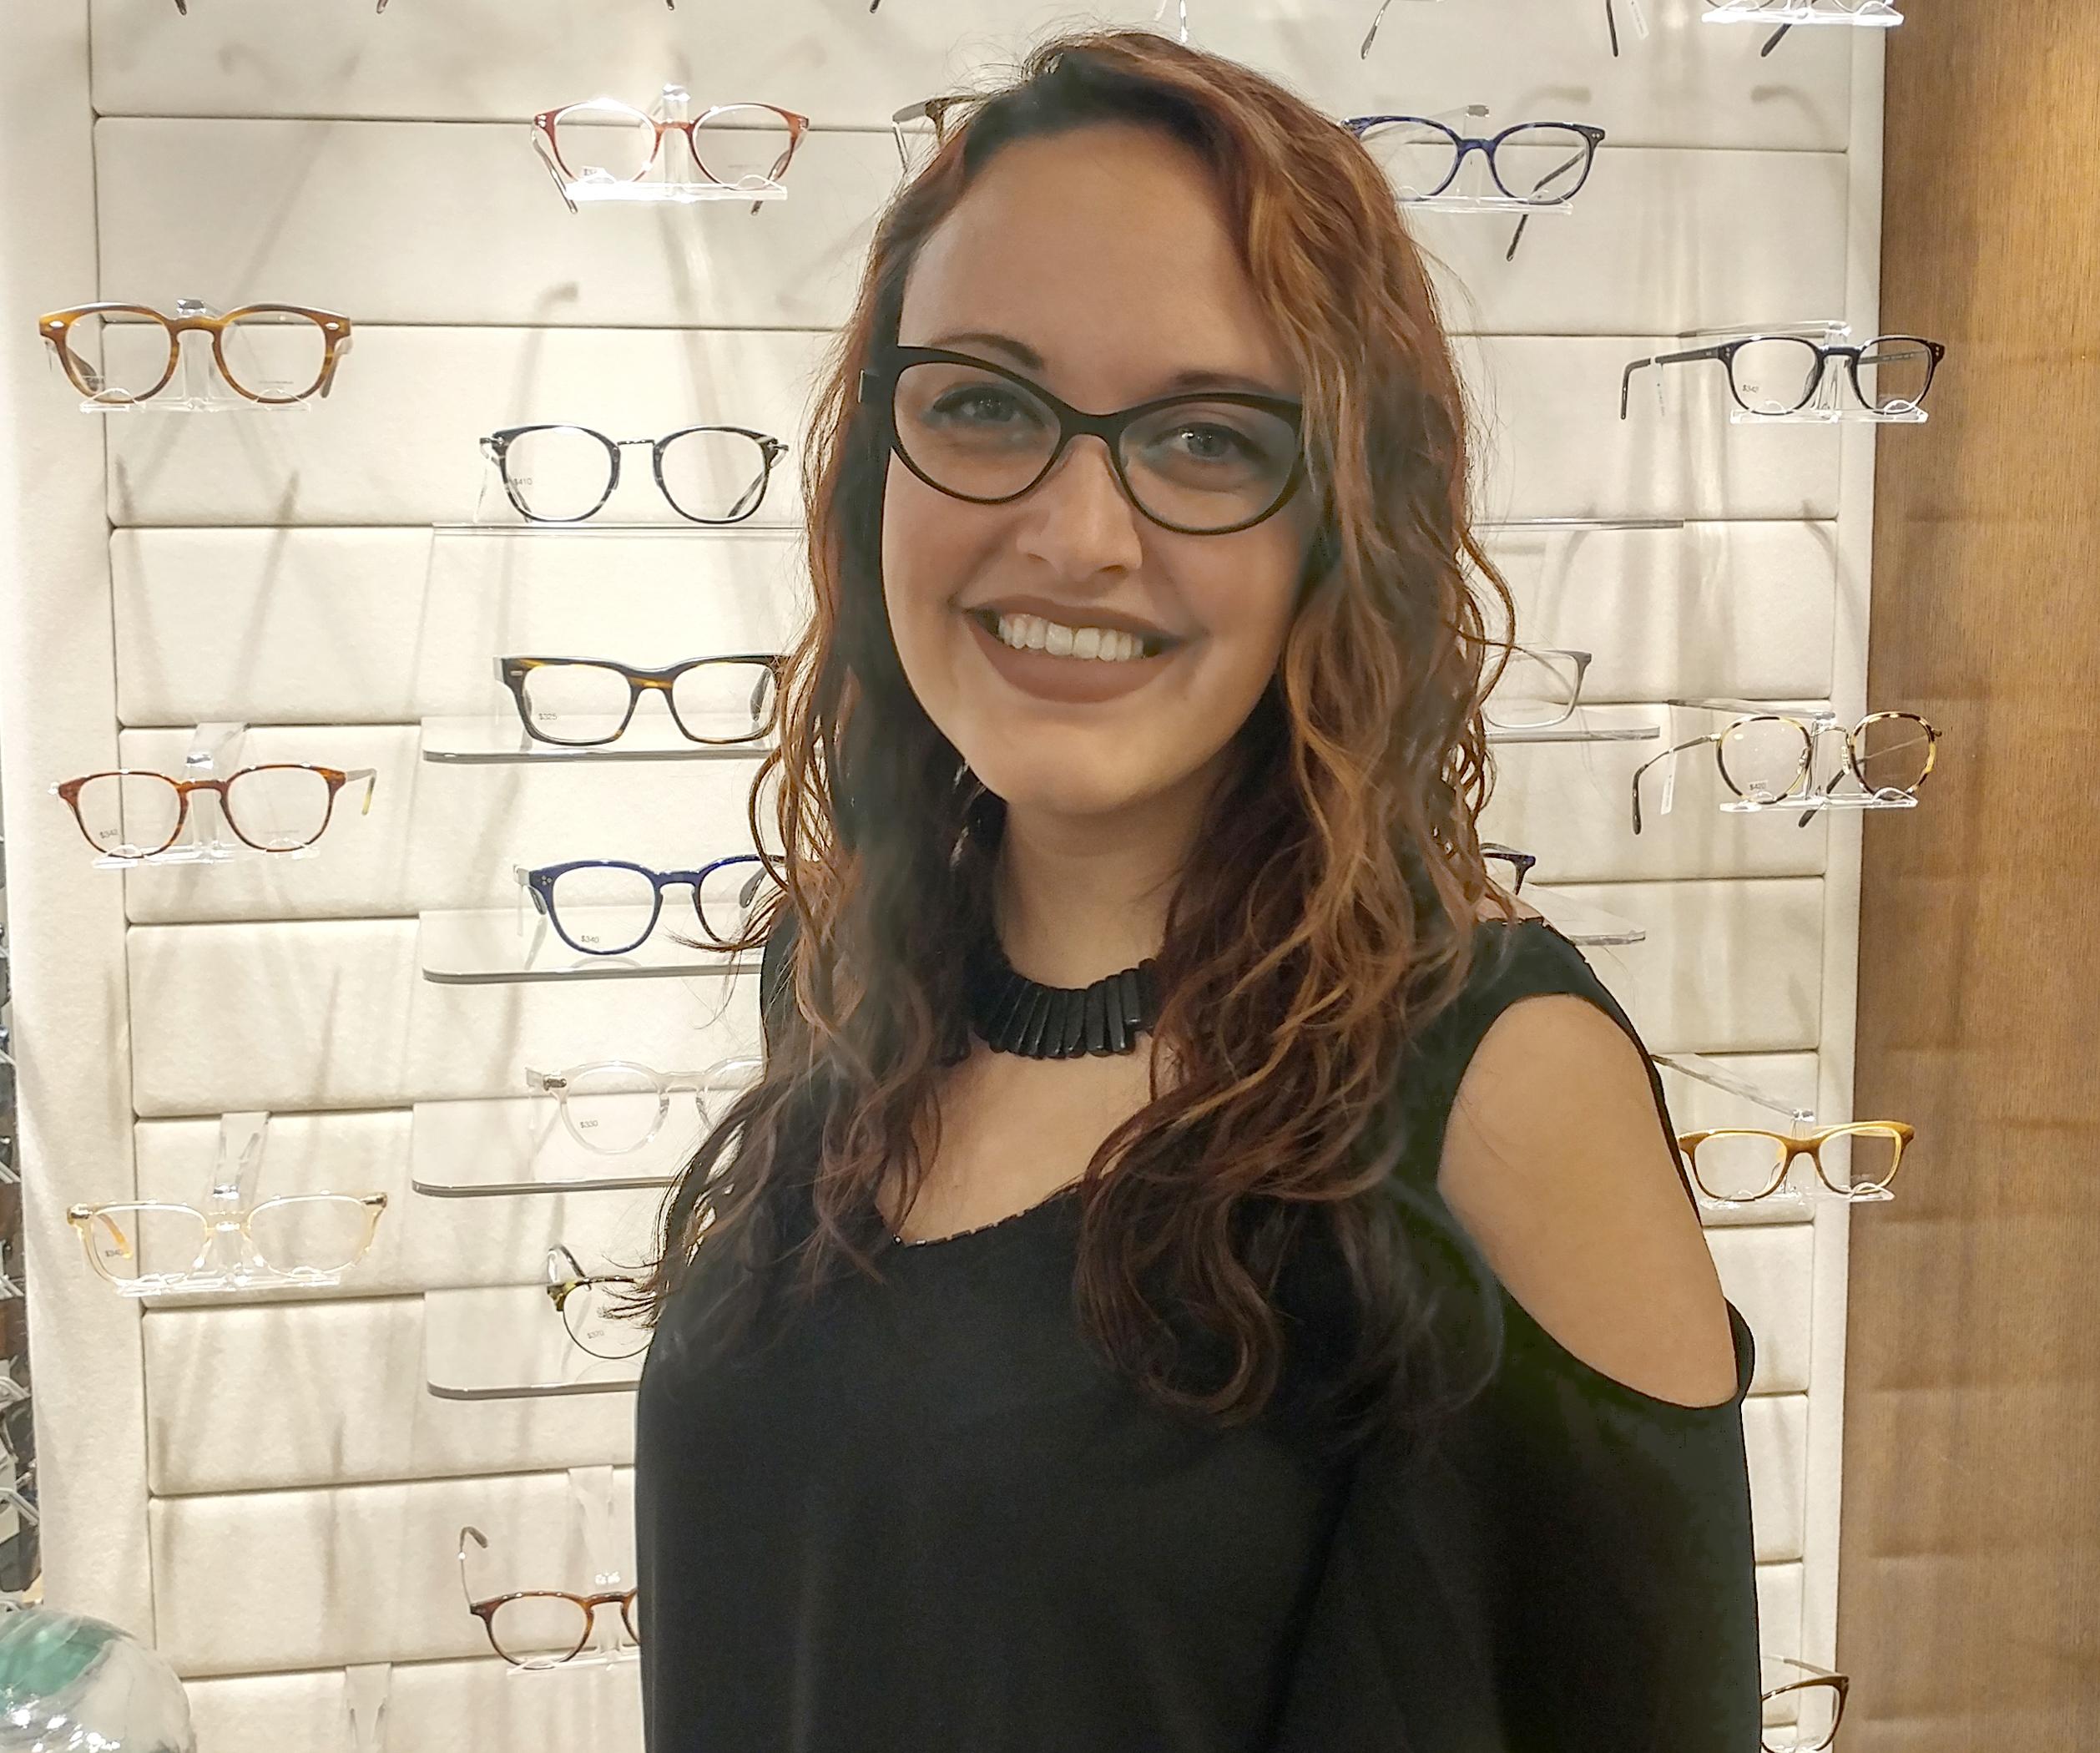 Nextgen Picking Up The Passion Of Opticianry Optical Prism Magazine